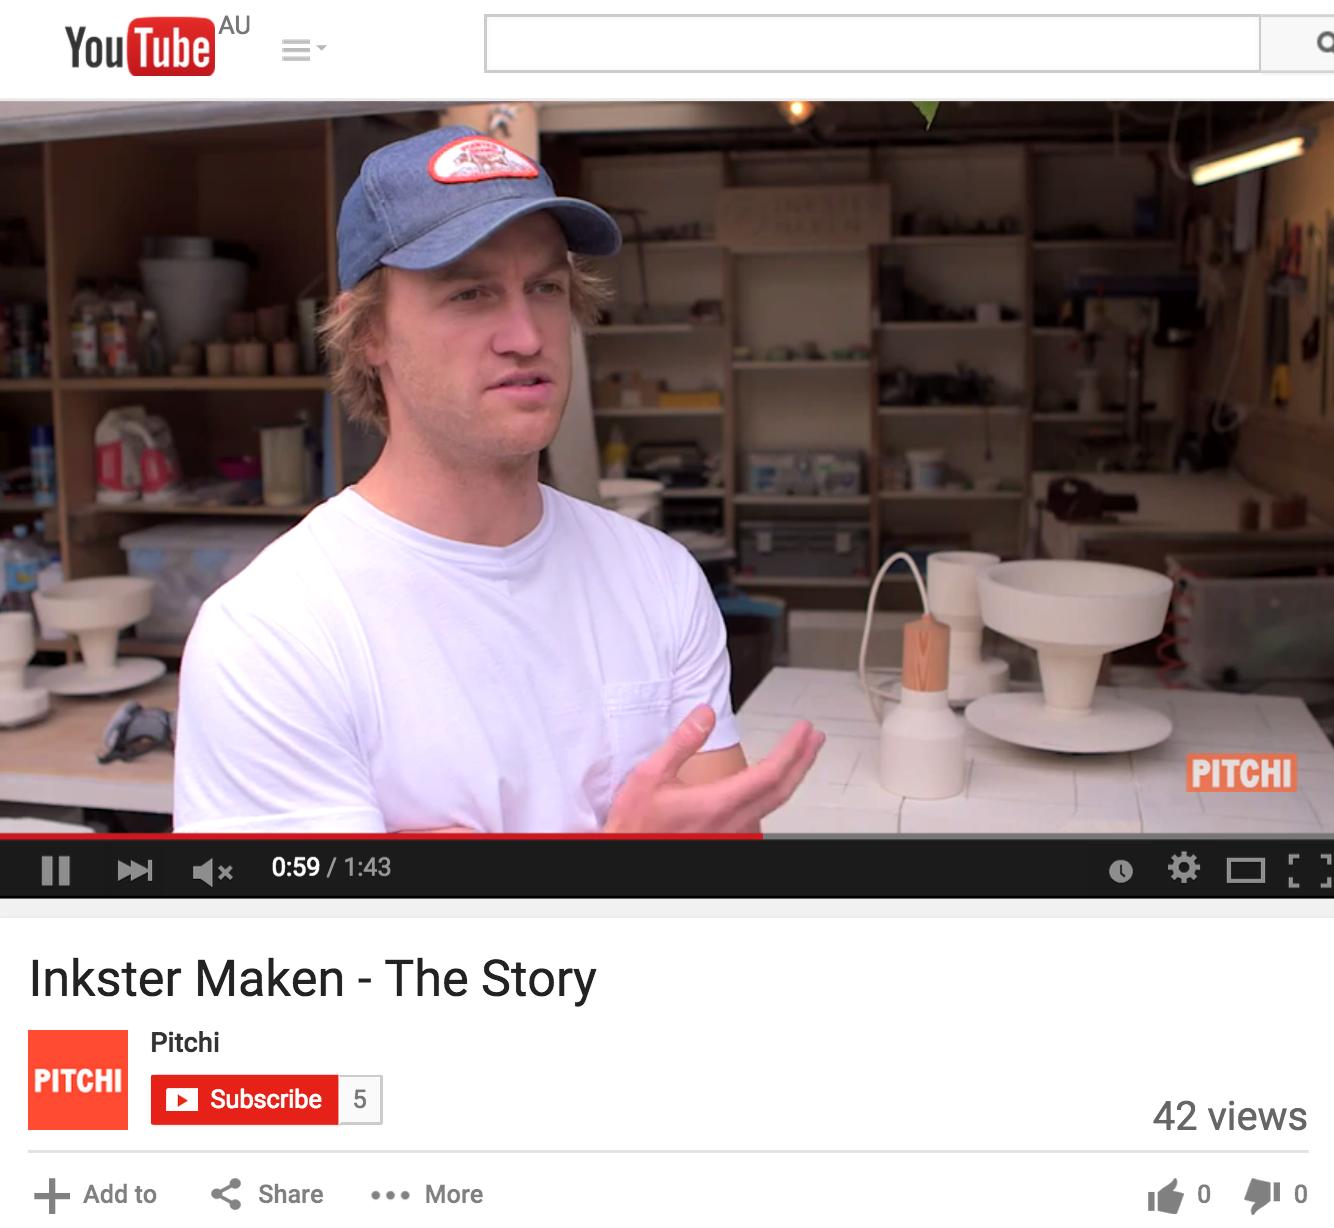 November 2014 | Pitchi.com | Inkster Maken Video Interview